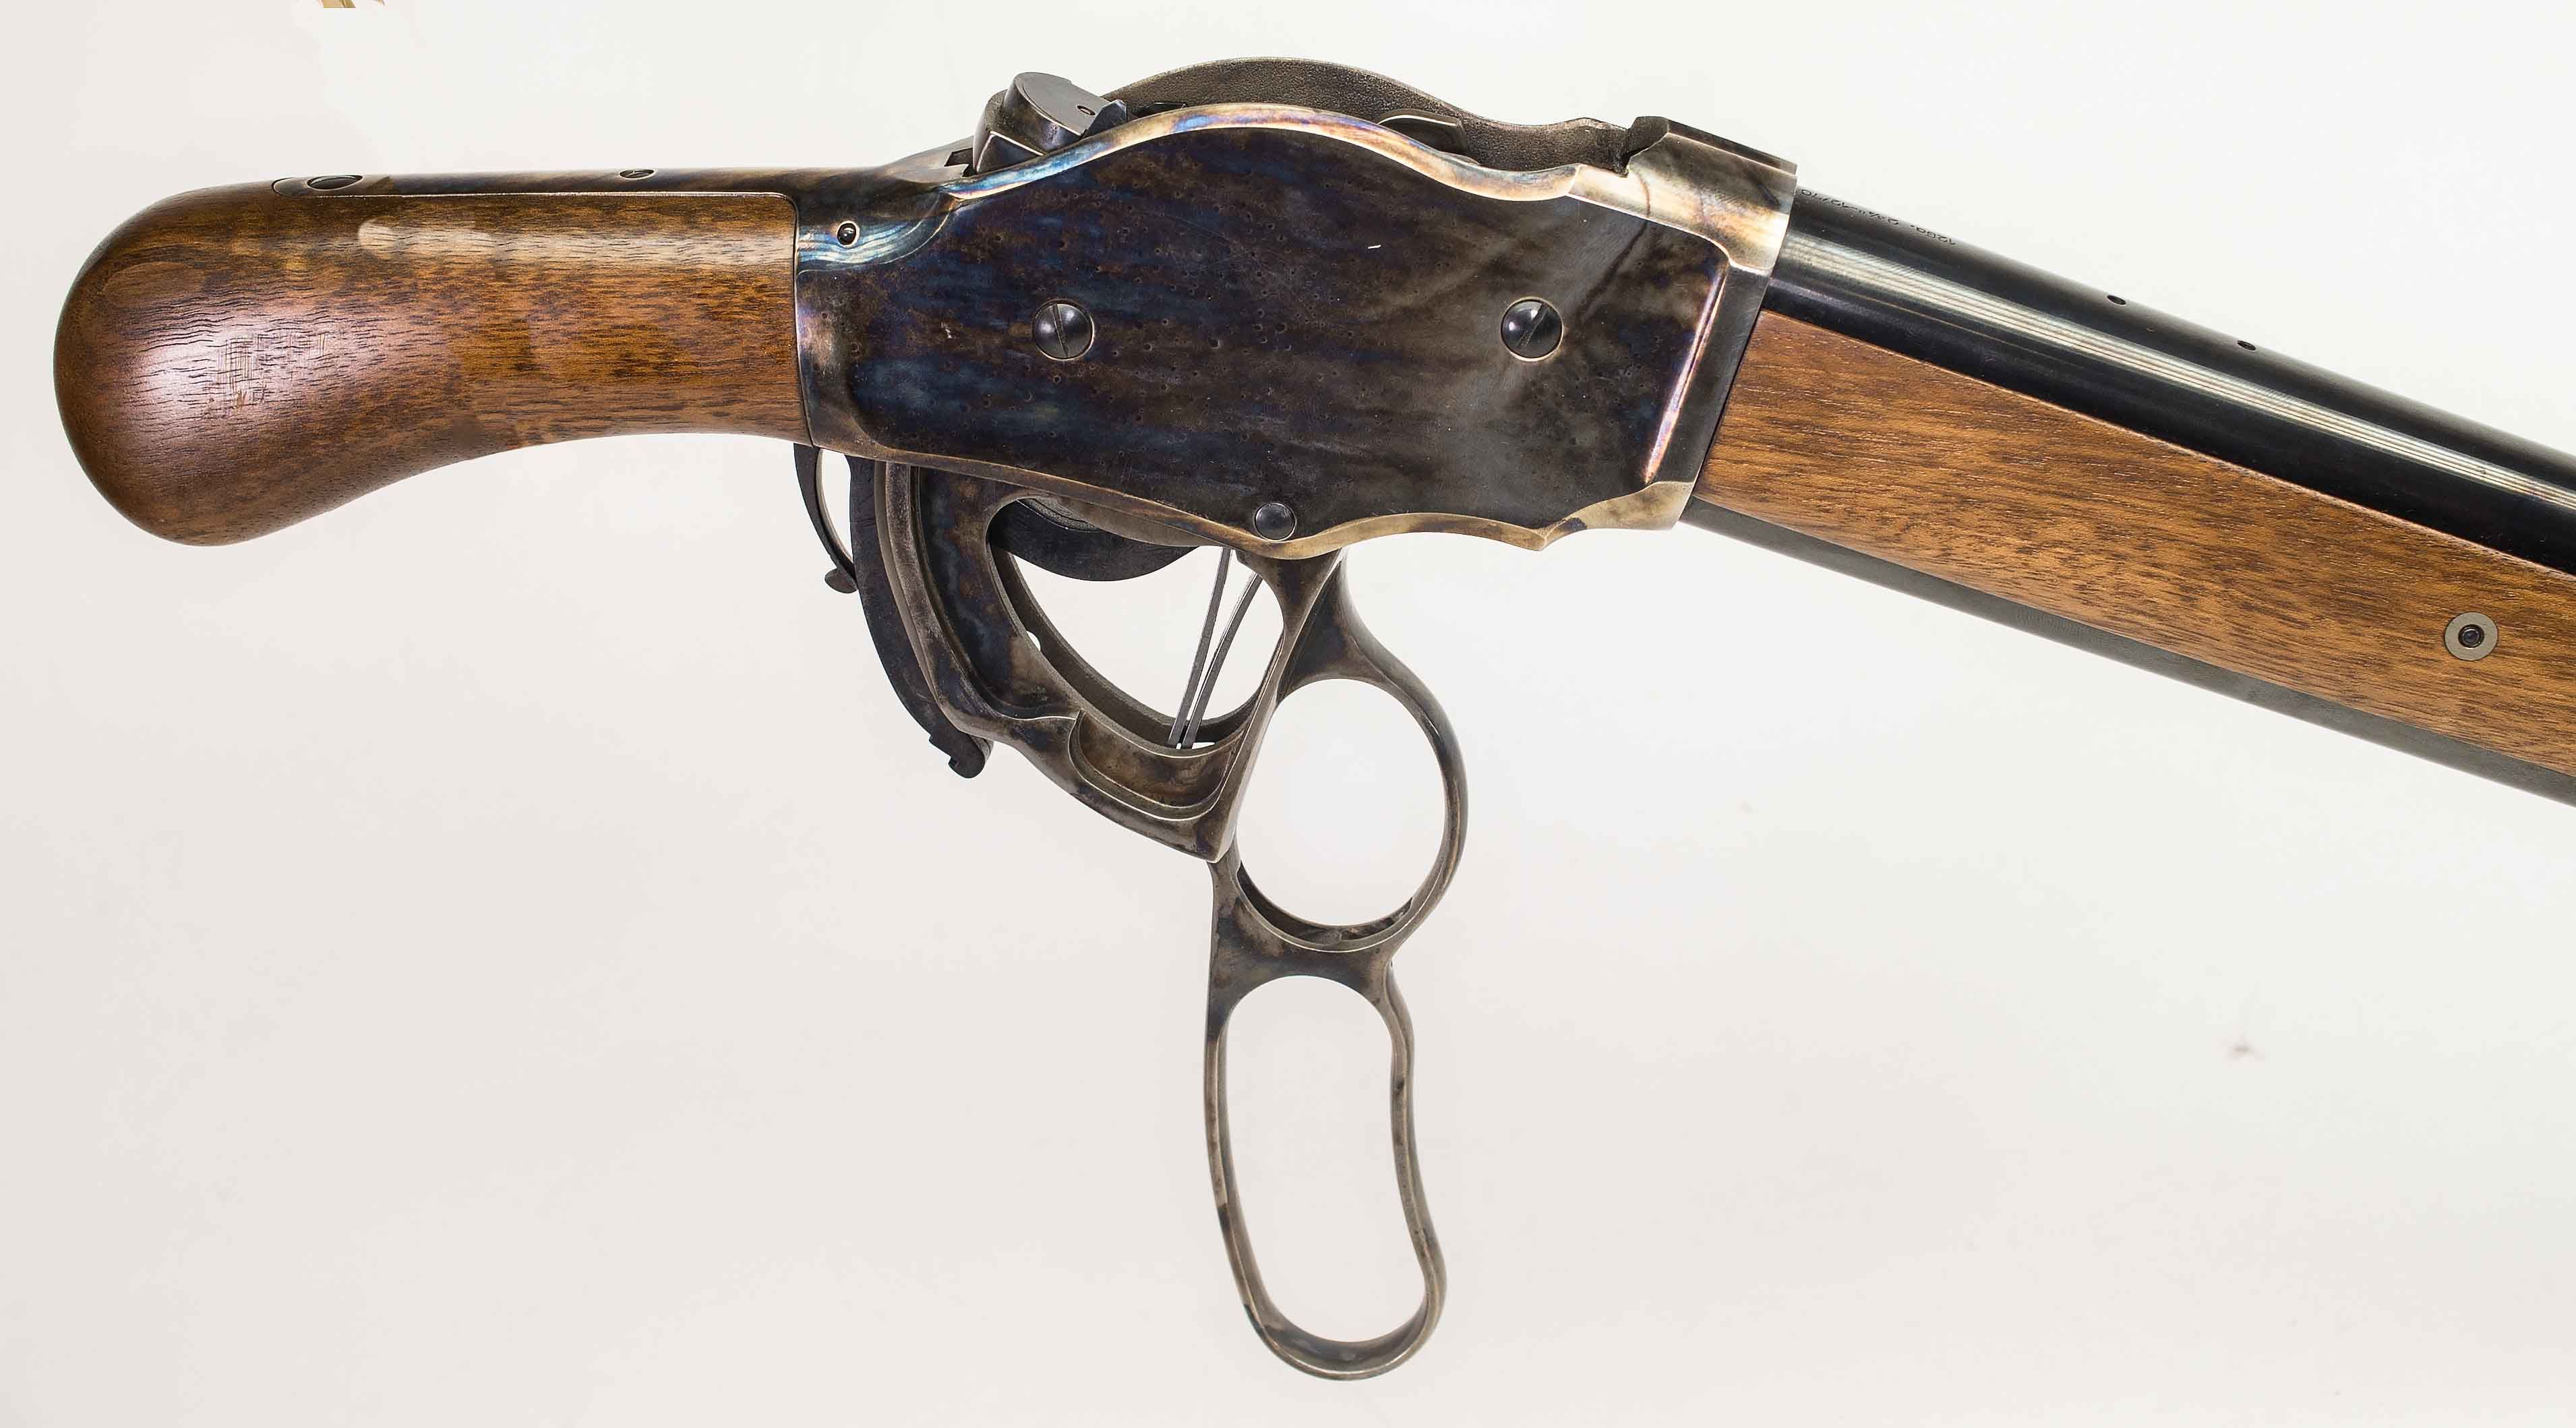 CHIAPPA MODEL 1887 MARES LEG SHOTGUN – 12 GAUGE (Auction ID